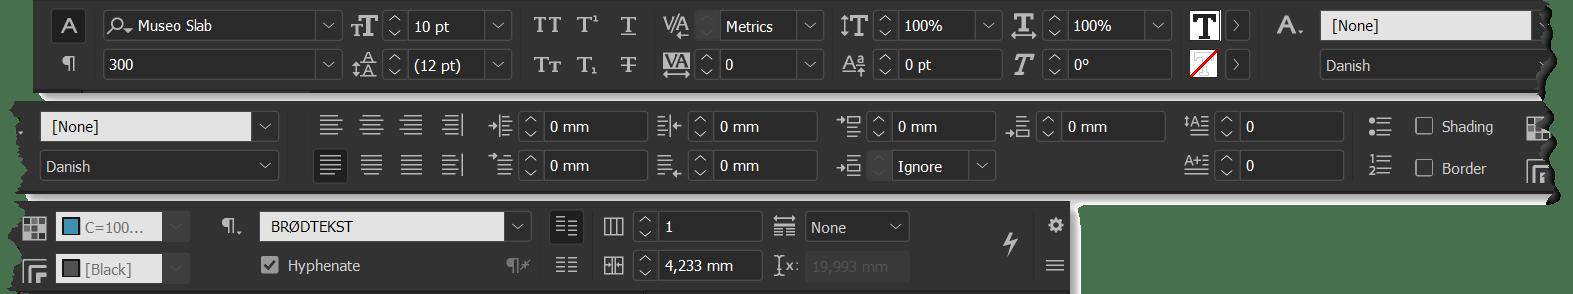 Control panel indesign